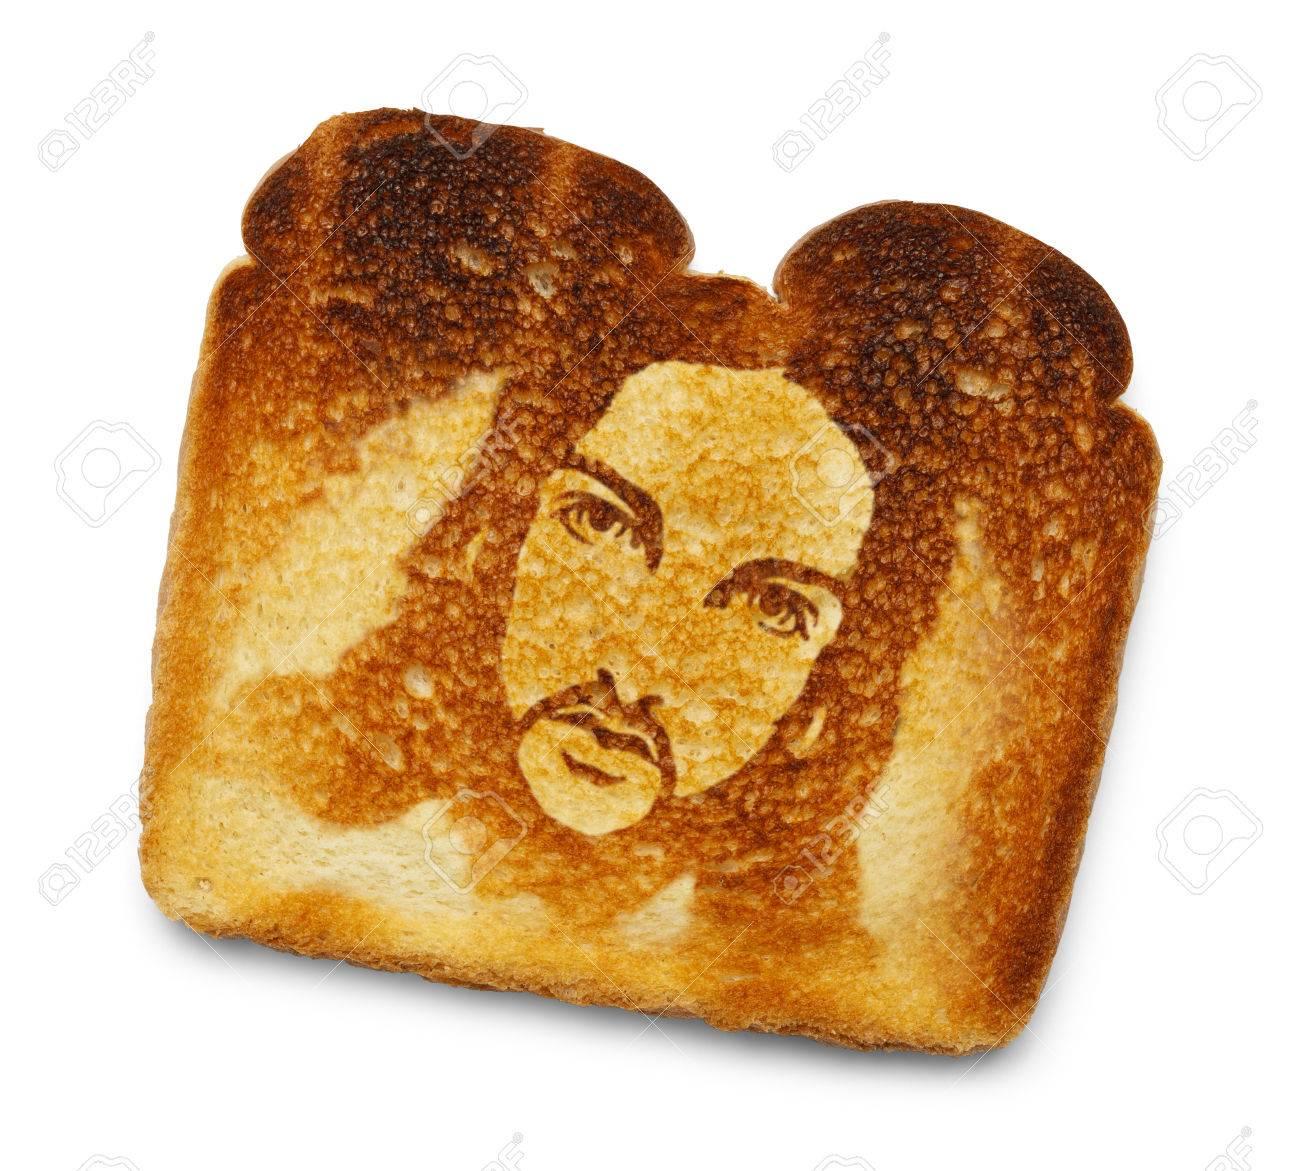 Burnt Toast With Image Of Jesus Isolated On White Background 1300x1171